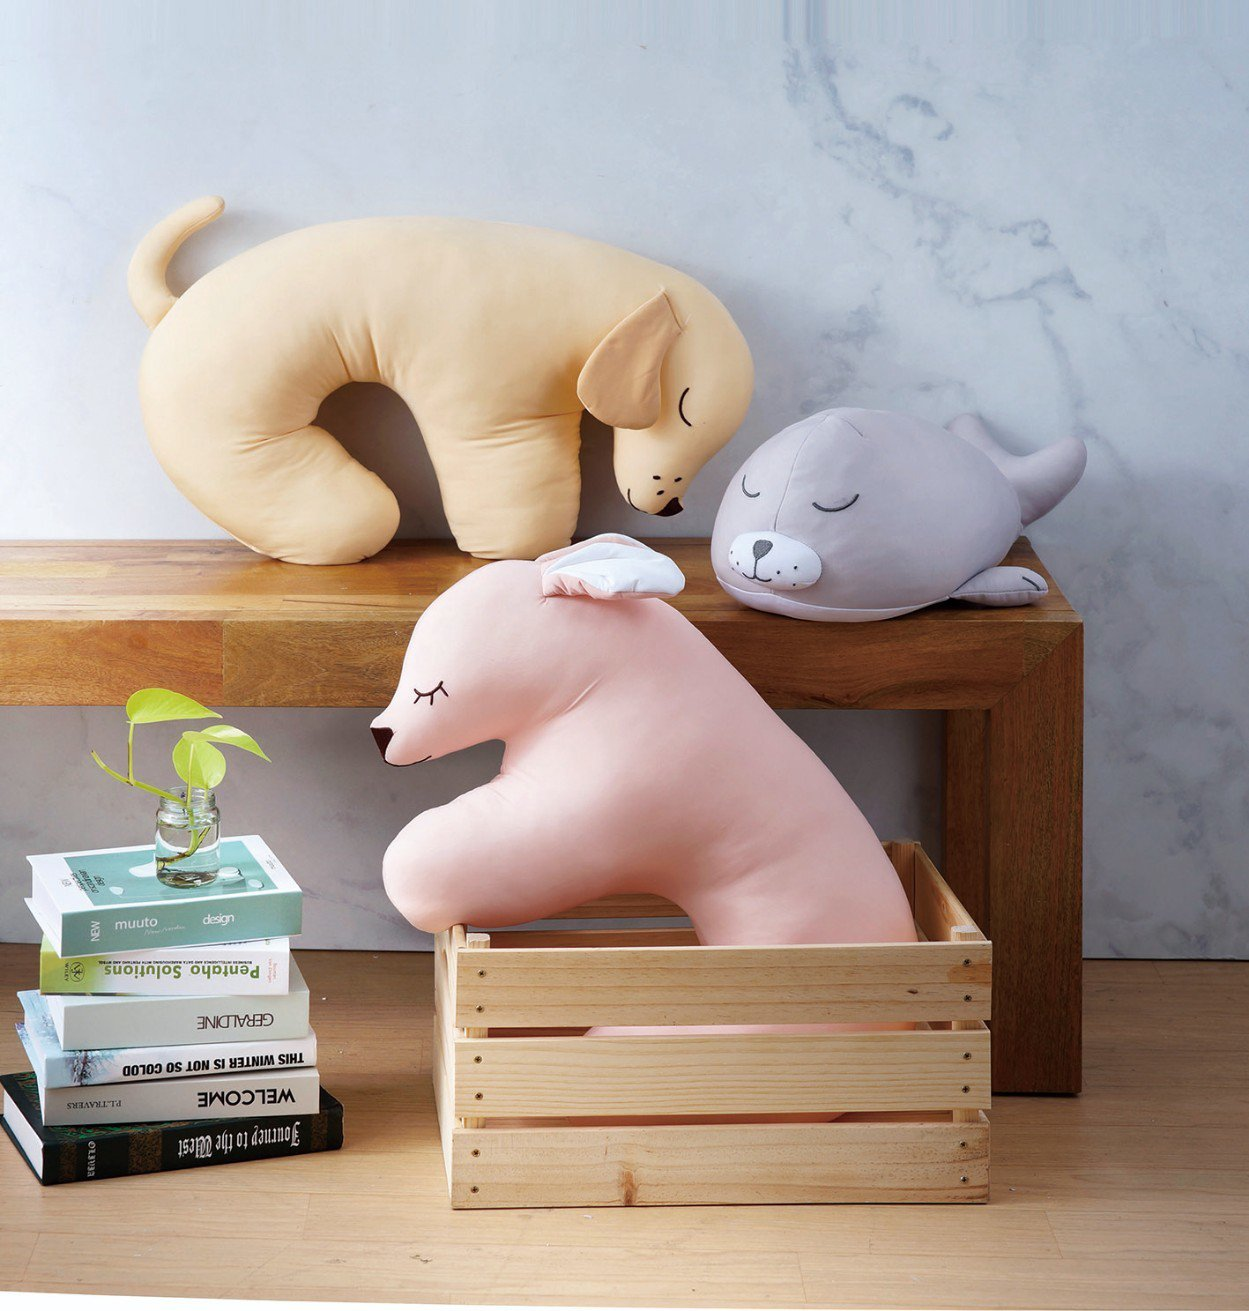 HOLA特力和樂涼感造型抱枕是今夏熱銷品項,平均單月可賣出近2,000件。圖/H...